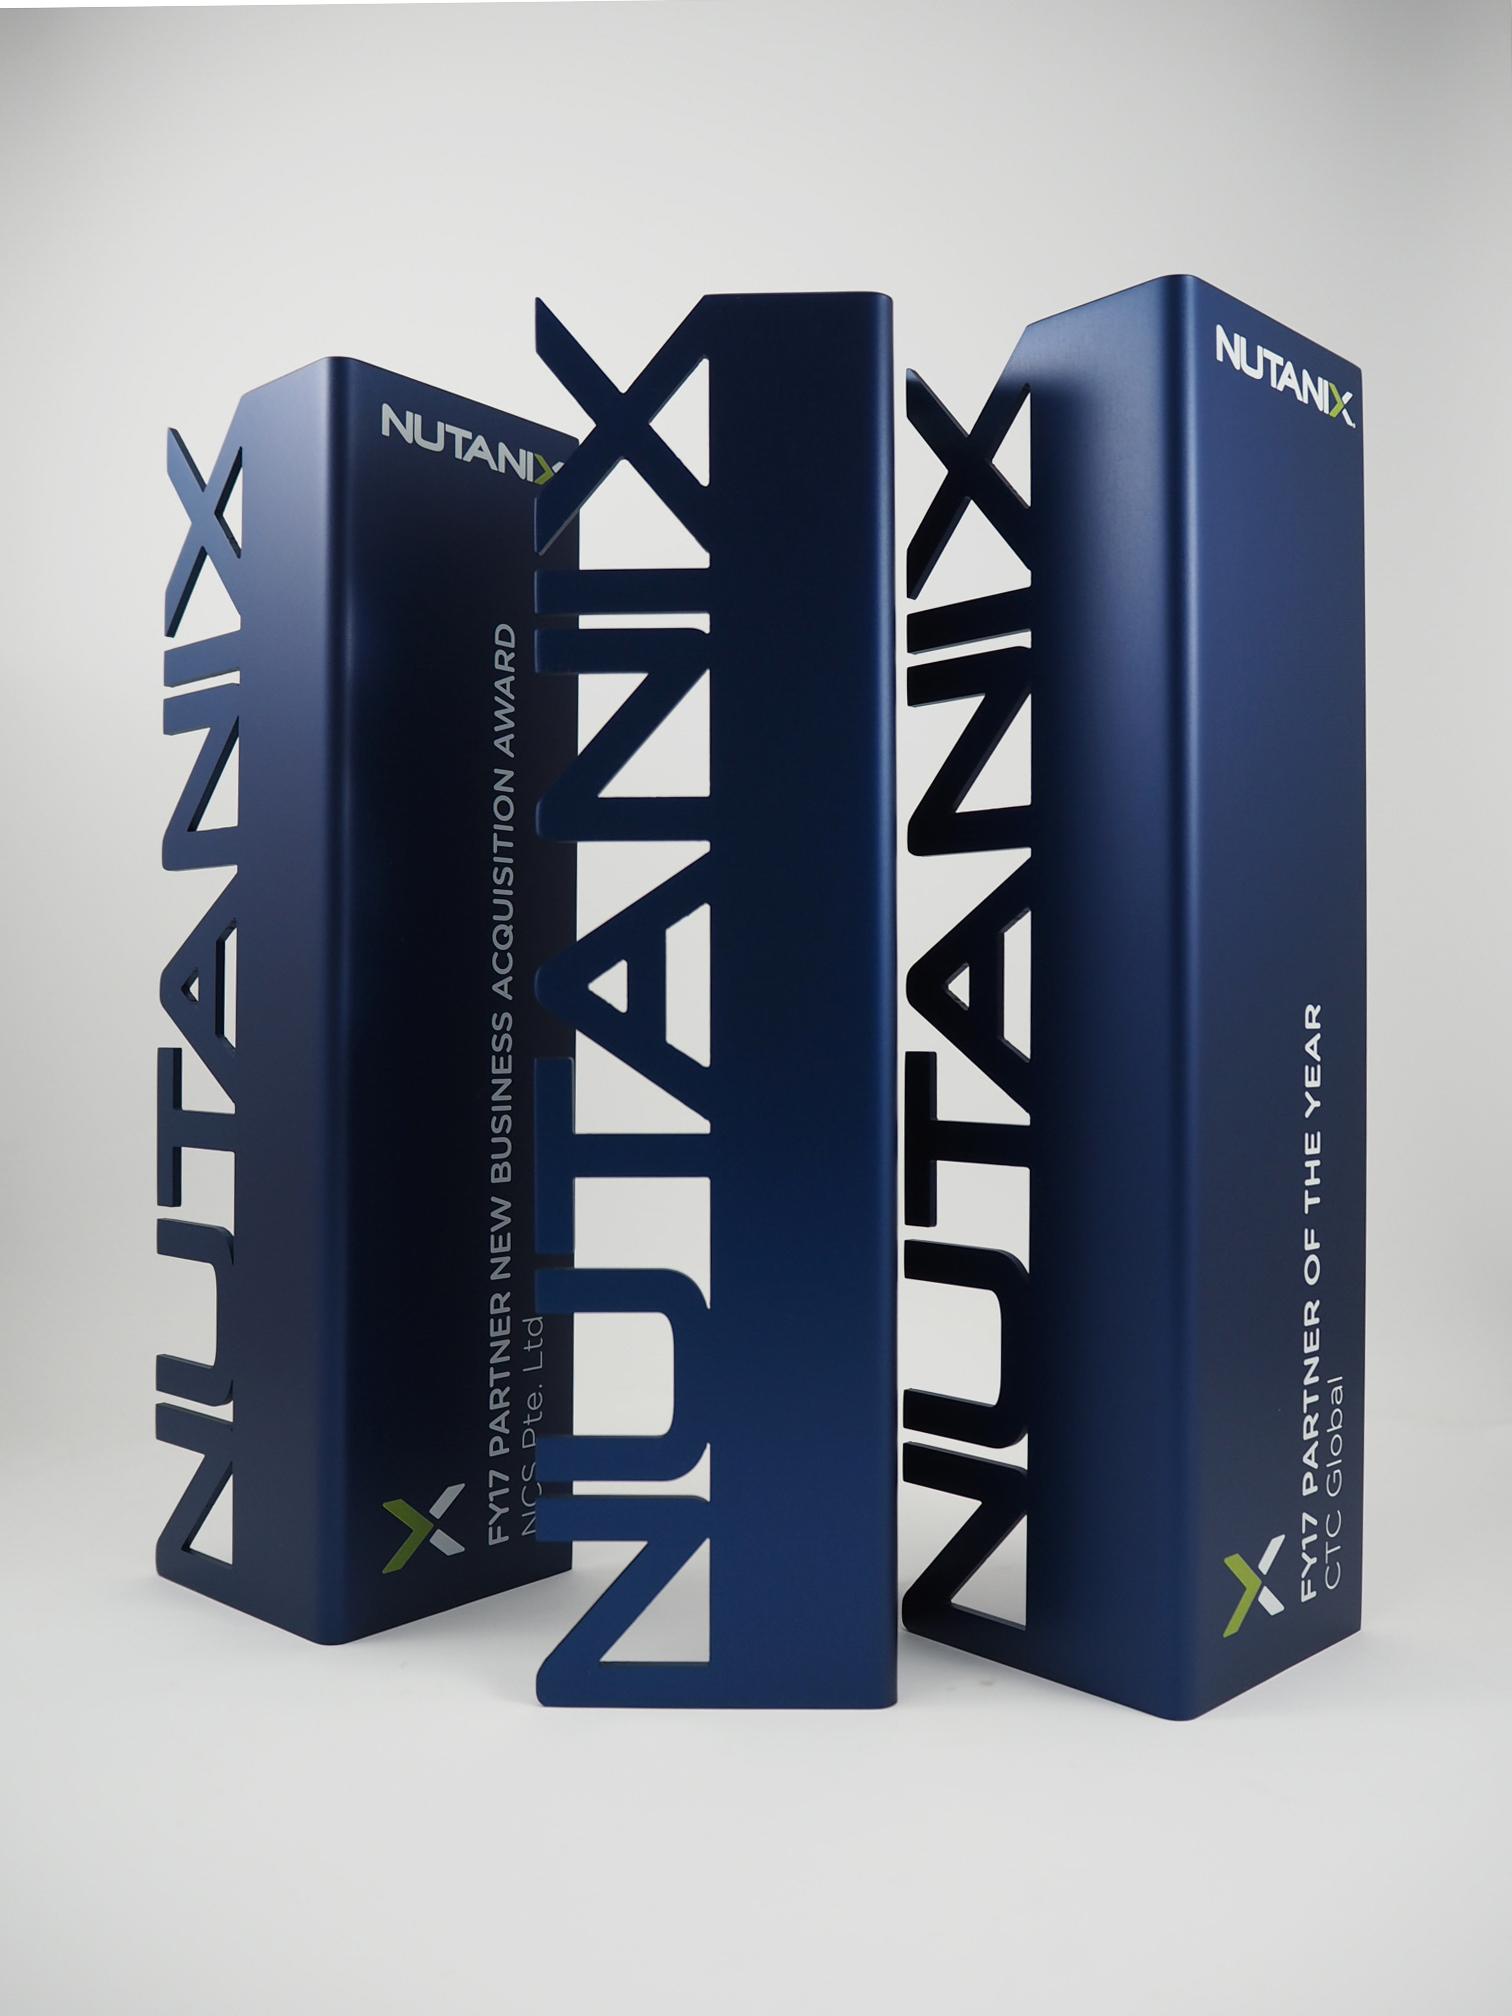 Nutanix-eco-aluminium-trophy-award-04.jpg